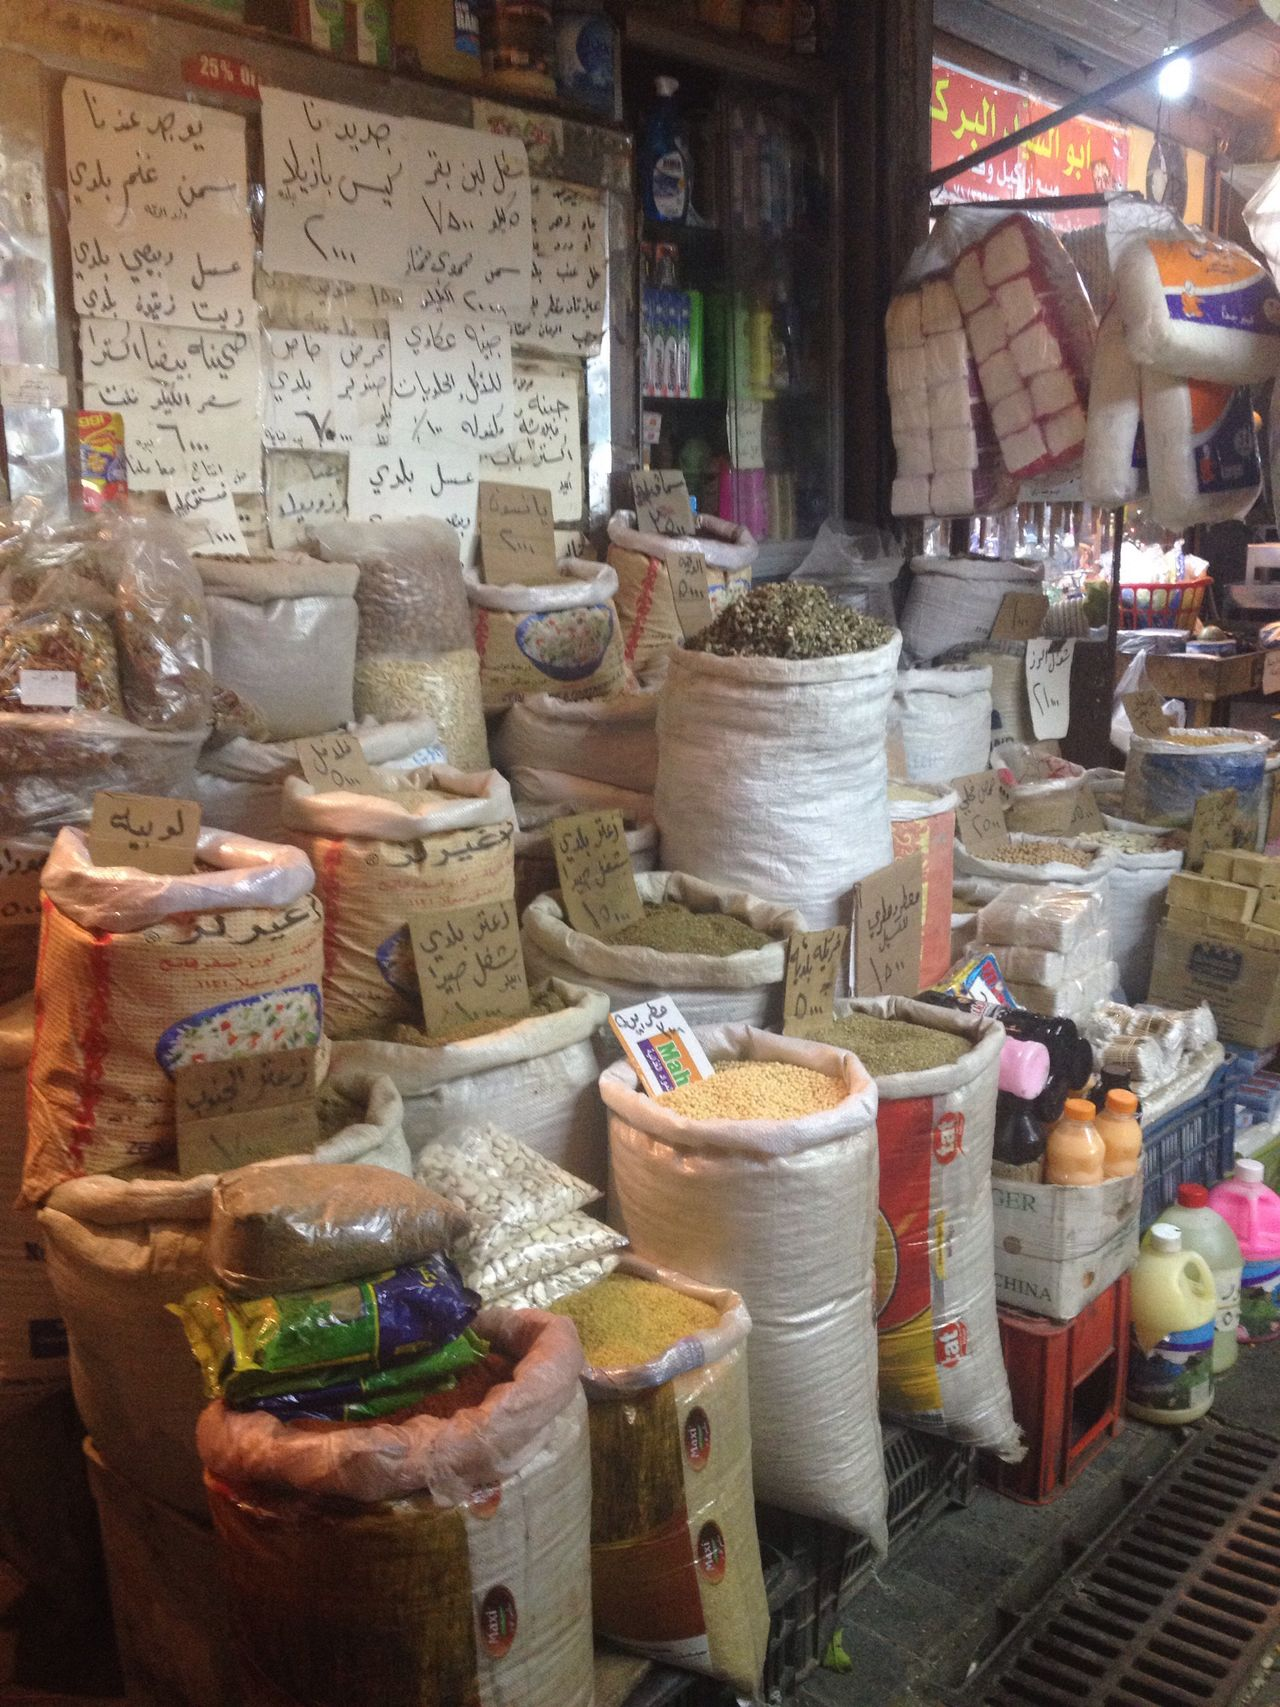 Market Old Souk Sidon Lebanon East Mediterranean